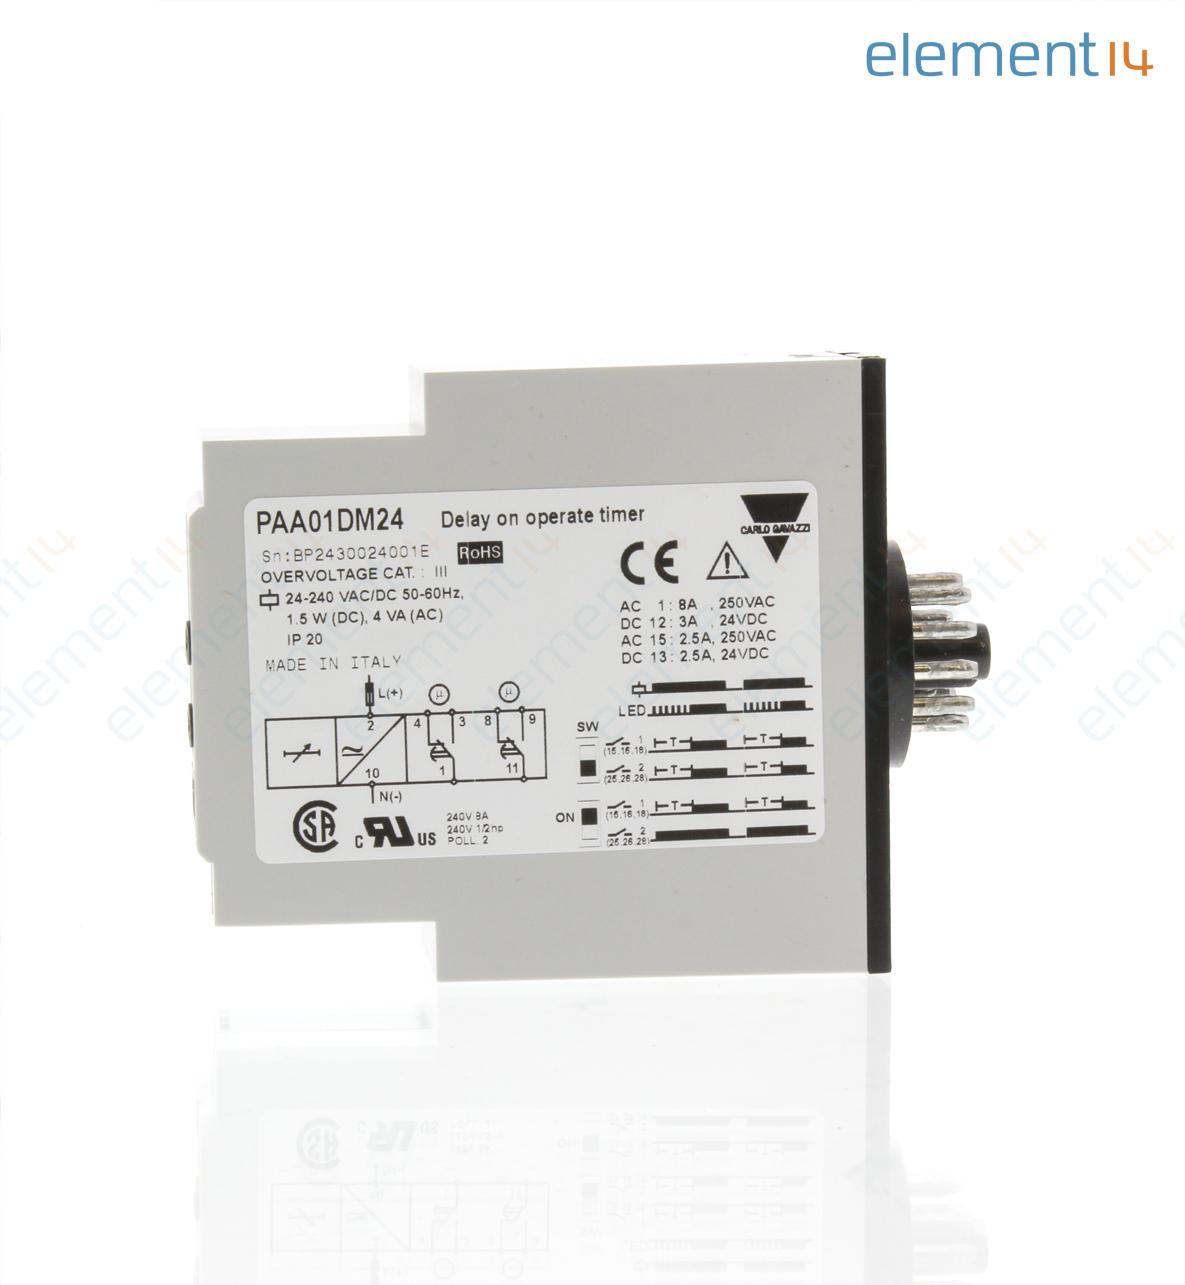 Paa01dm24 Carlo Gavazzi Analog Timer Multi Voltage Paa01 Series Np Sensor Tester Wiring Diagram Add To Compare